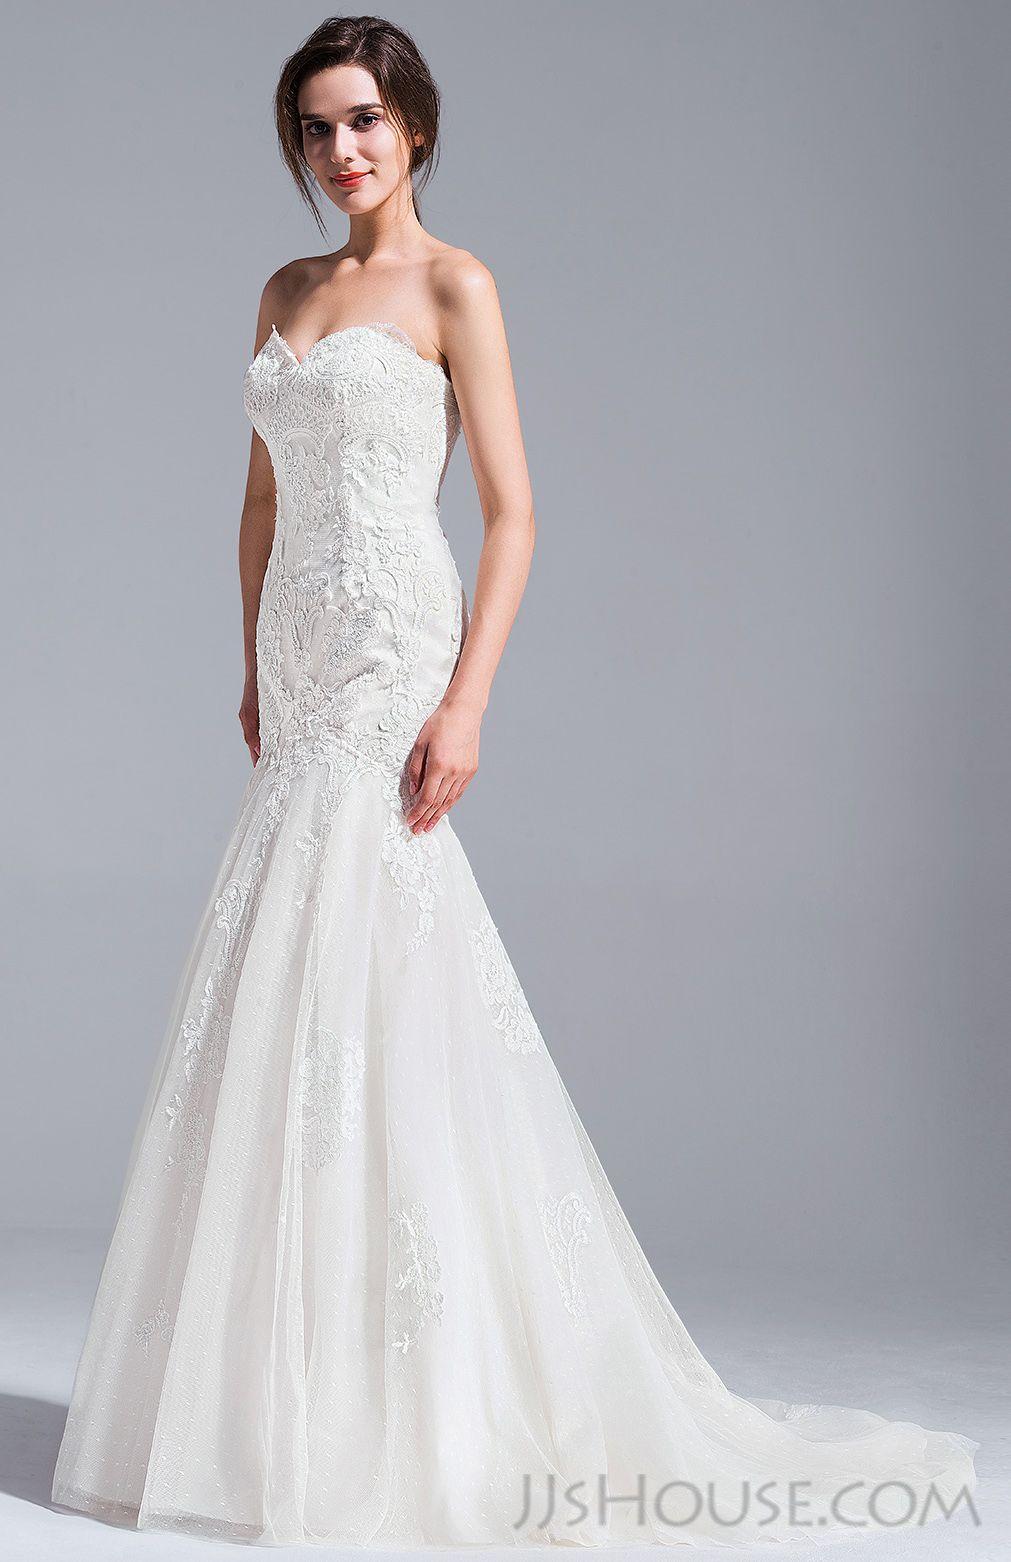 Us 385 00 Trumpet Mermaid Sweetheart Court Train Lace Wedding Dress Jj S House Wedding Dresses Lace Stunning Wedding Dresses Wedding Dresses [ 1562 x 1011 Pixel ]